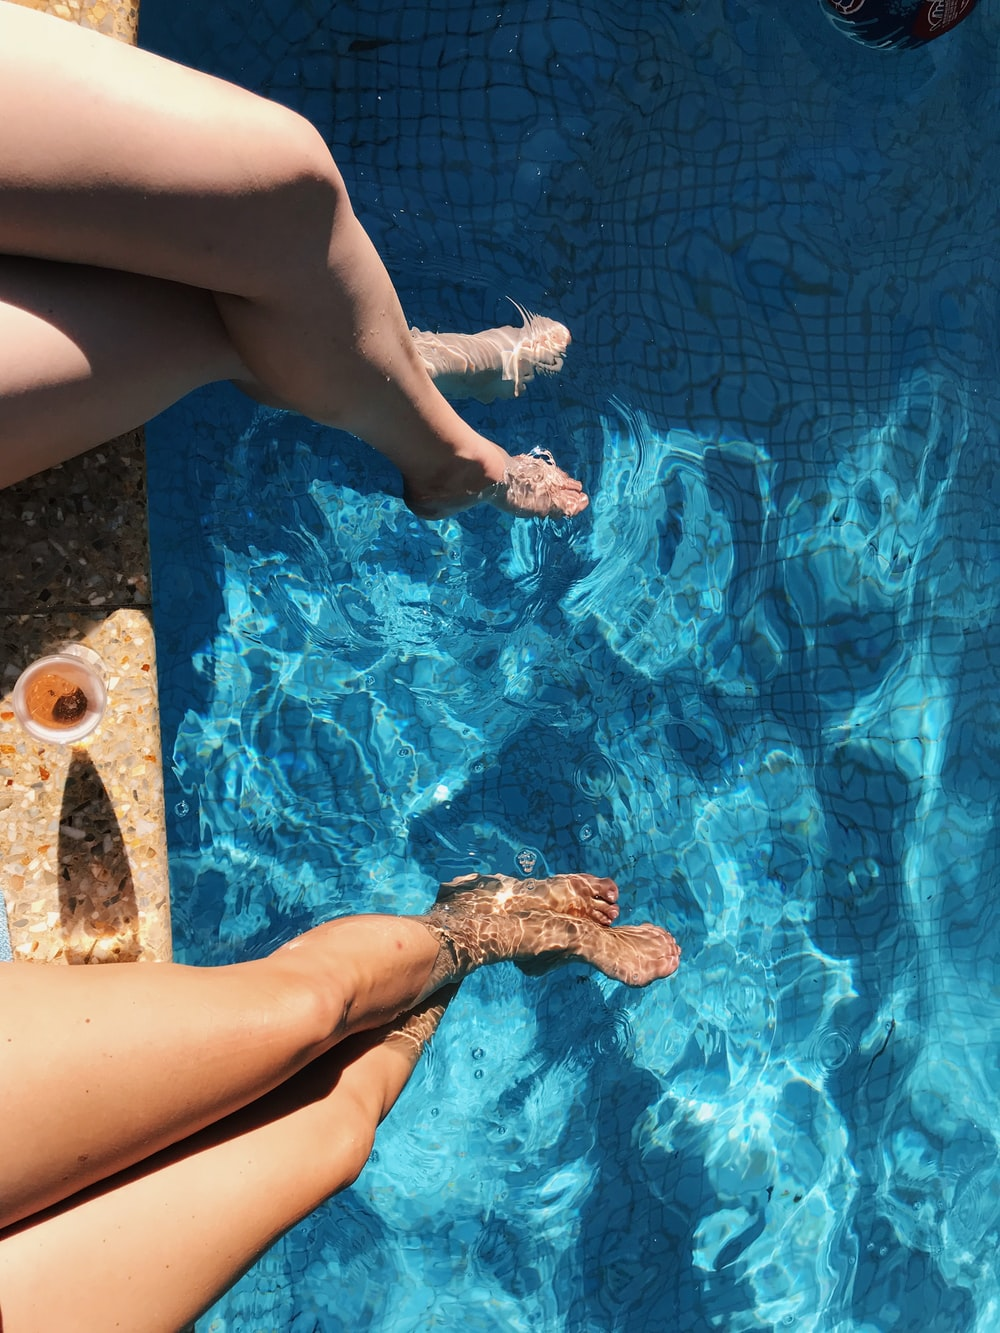 two women's feet in the pool